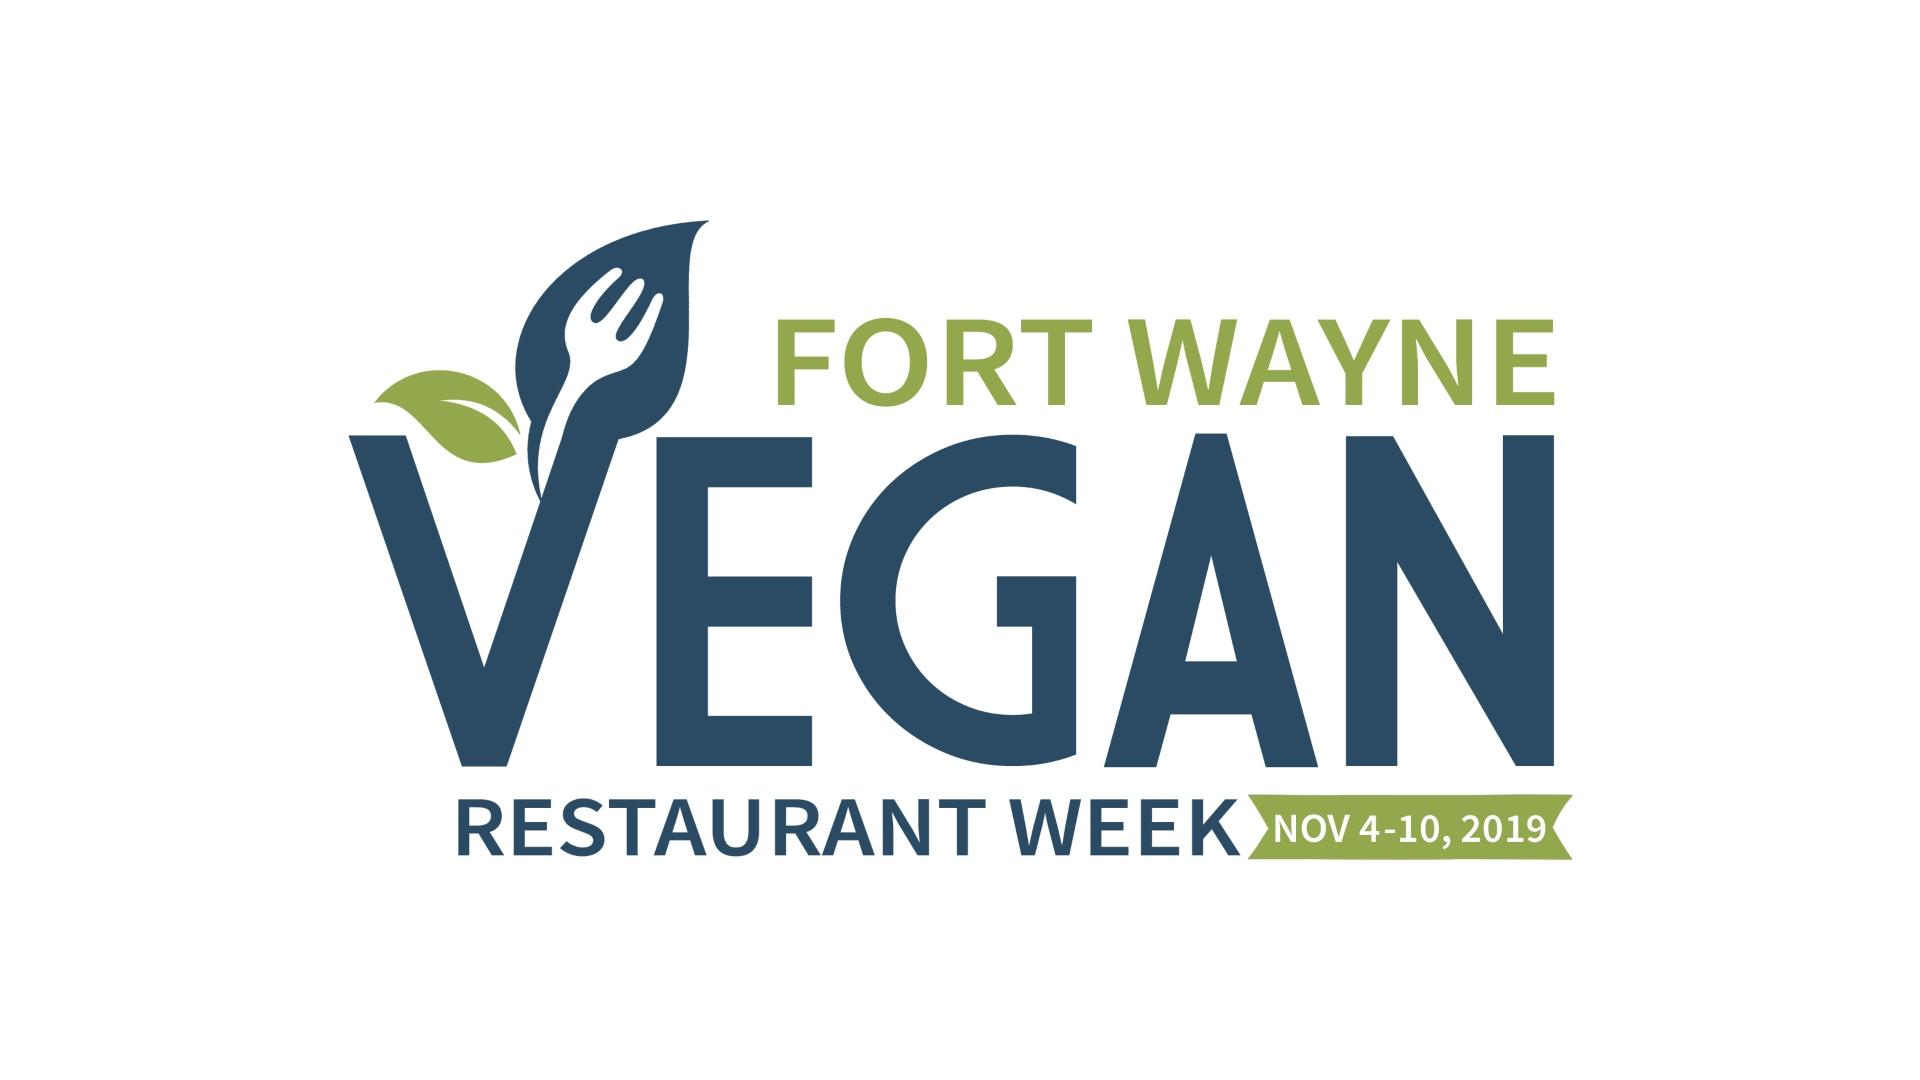 Fort Wayne Restaurants Celebrate First Vegan Restaurant Week